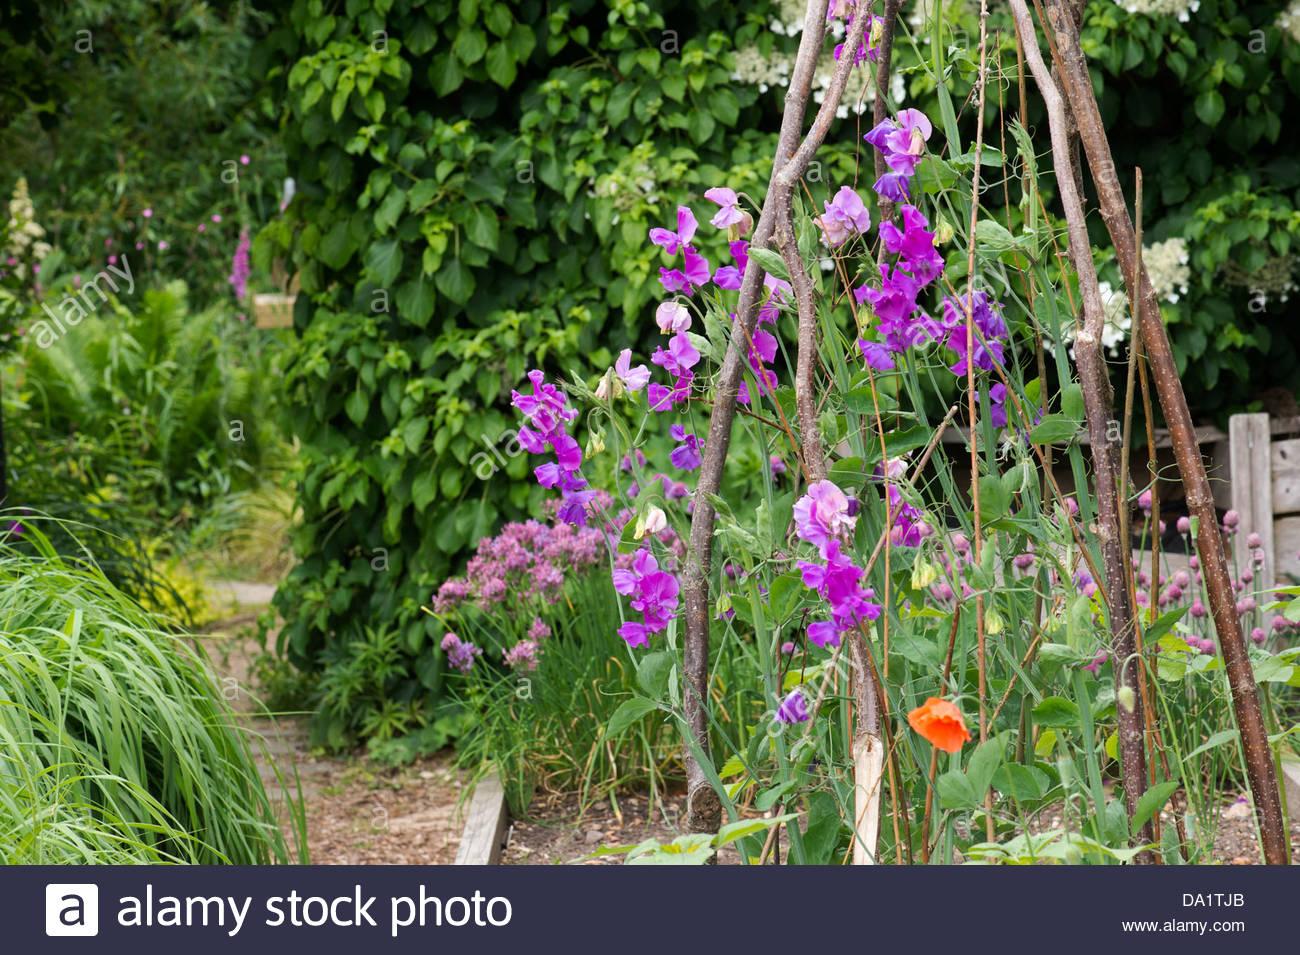 lathyrus latifolius. perennial pea or everlasting sweet pea, Natural flower